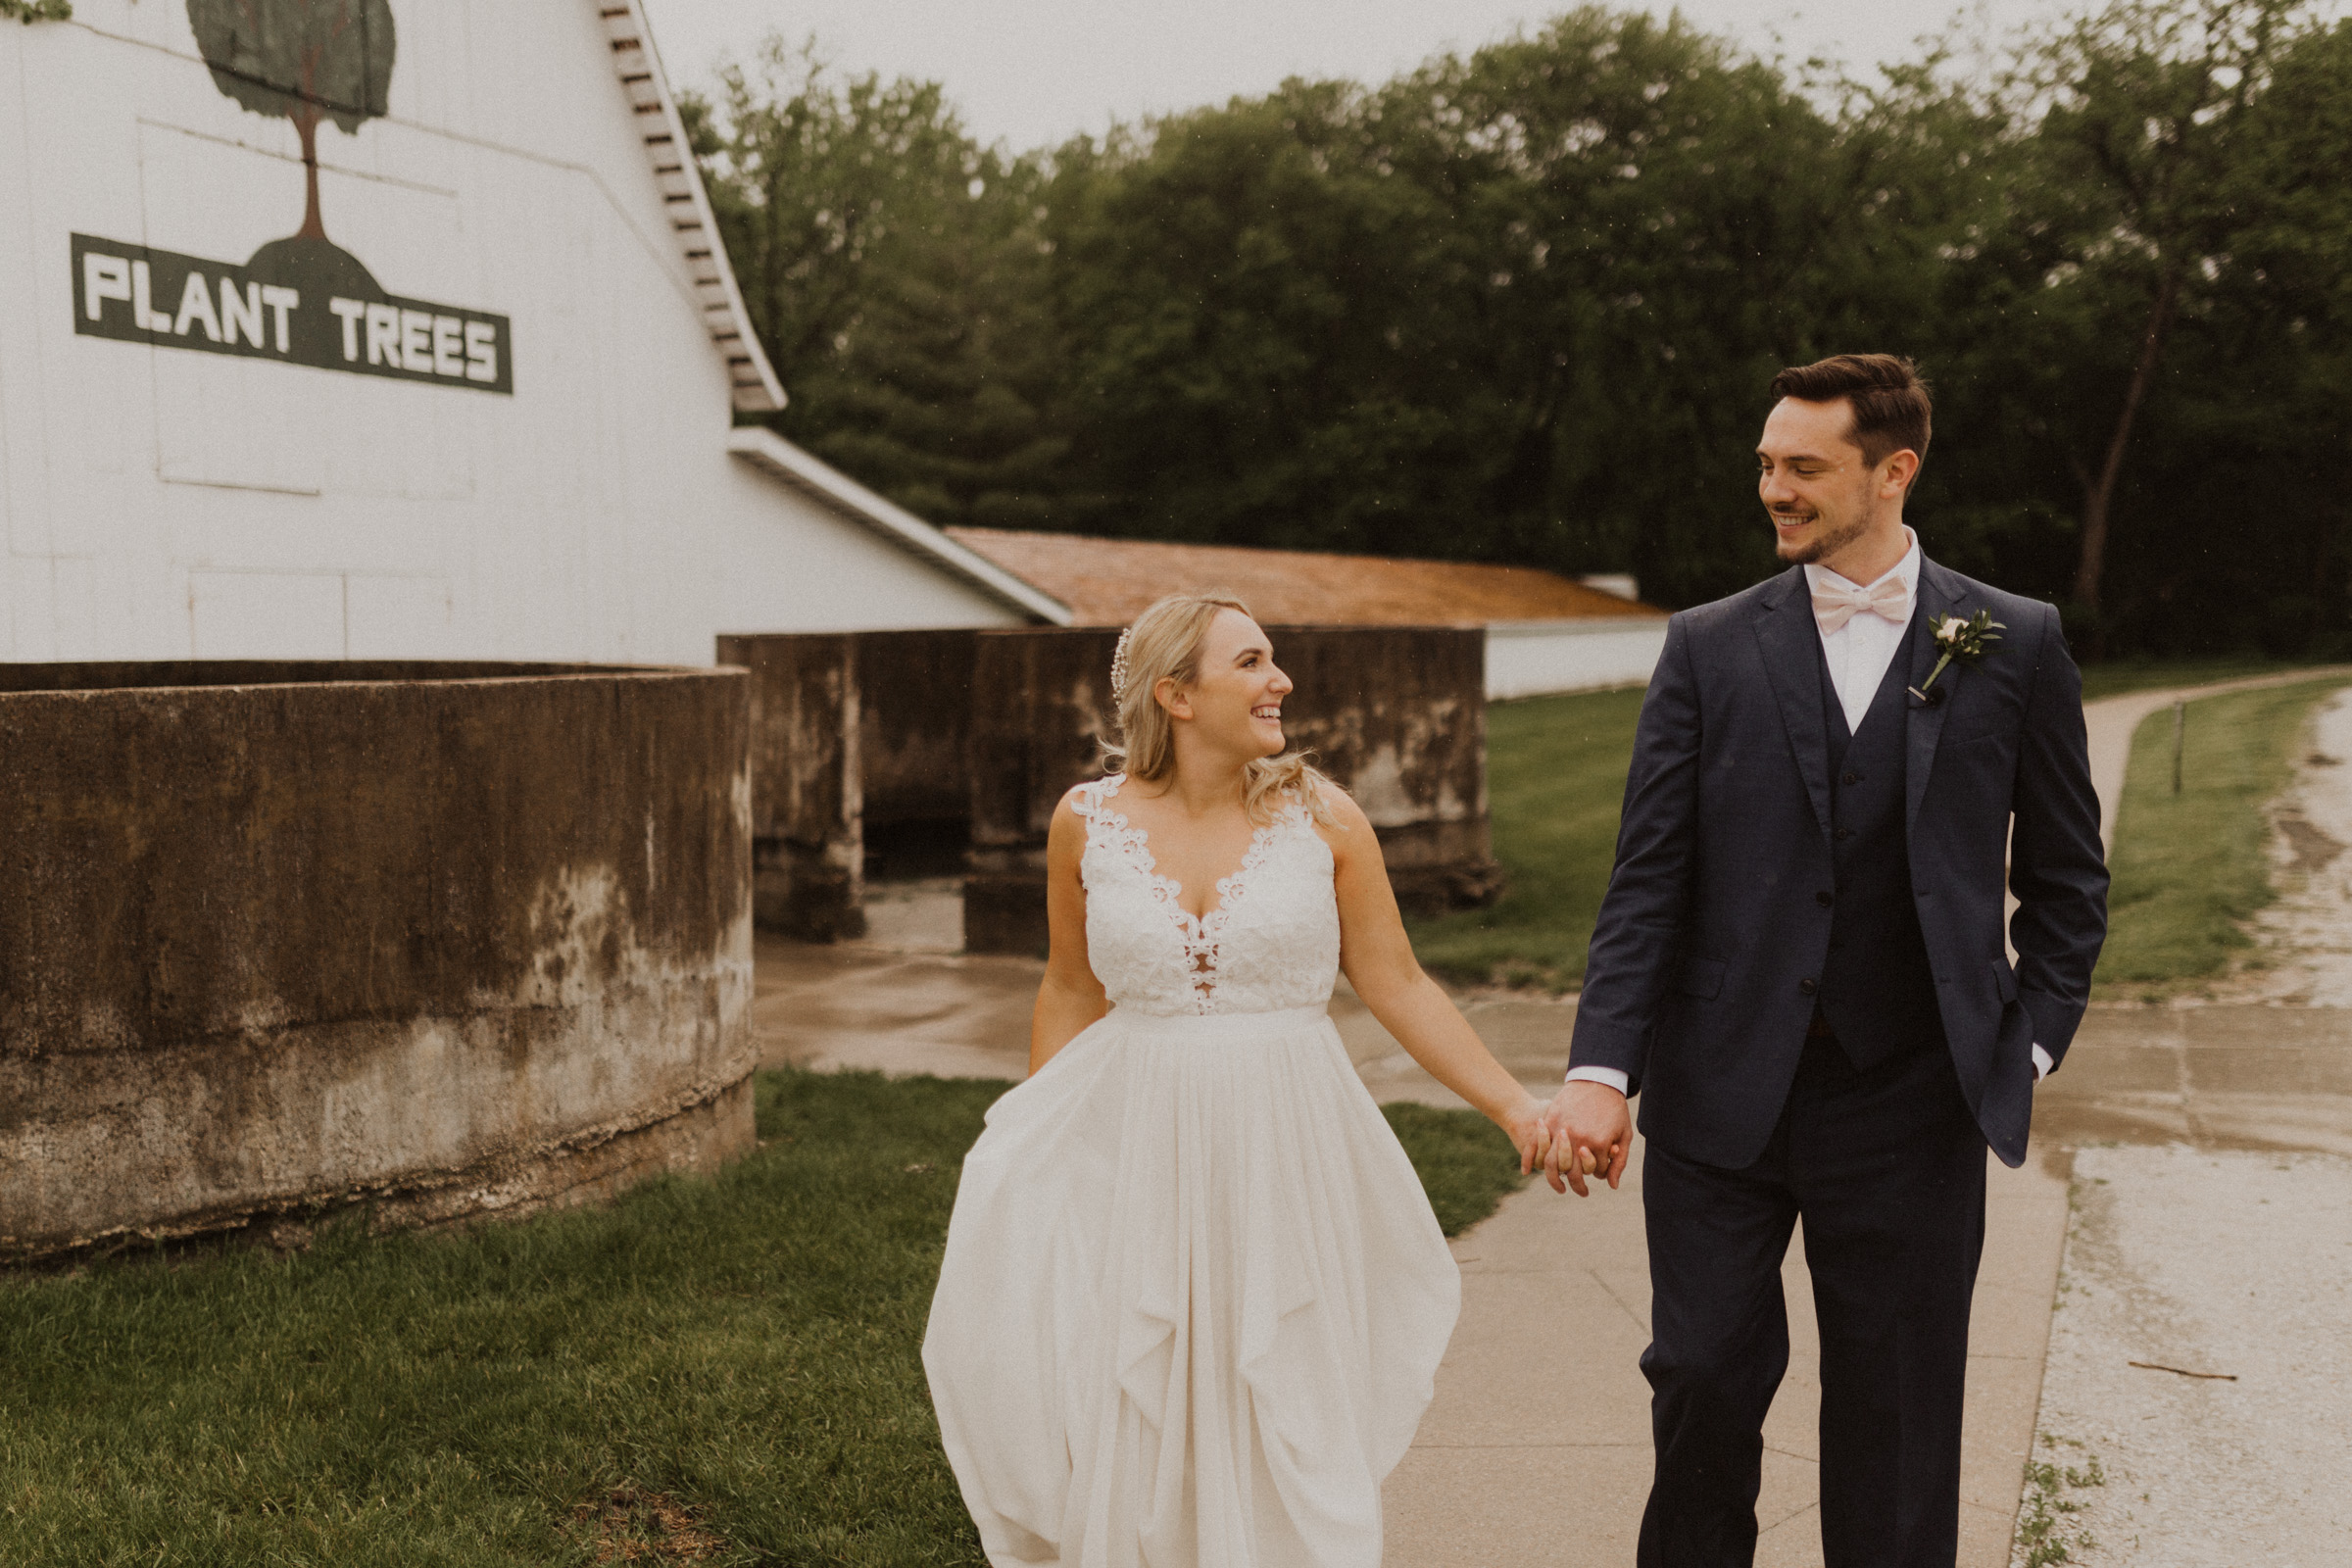 alyssa barletter photography nelson wedding nebraska city lied lodge morton barn spring wedding photographer-43.jpg